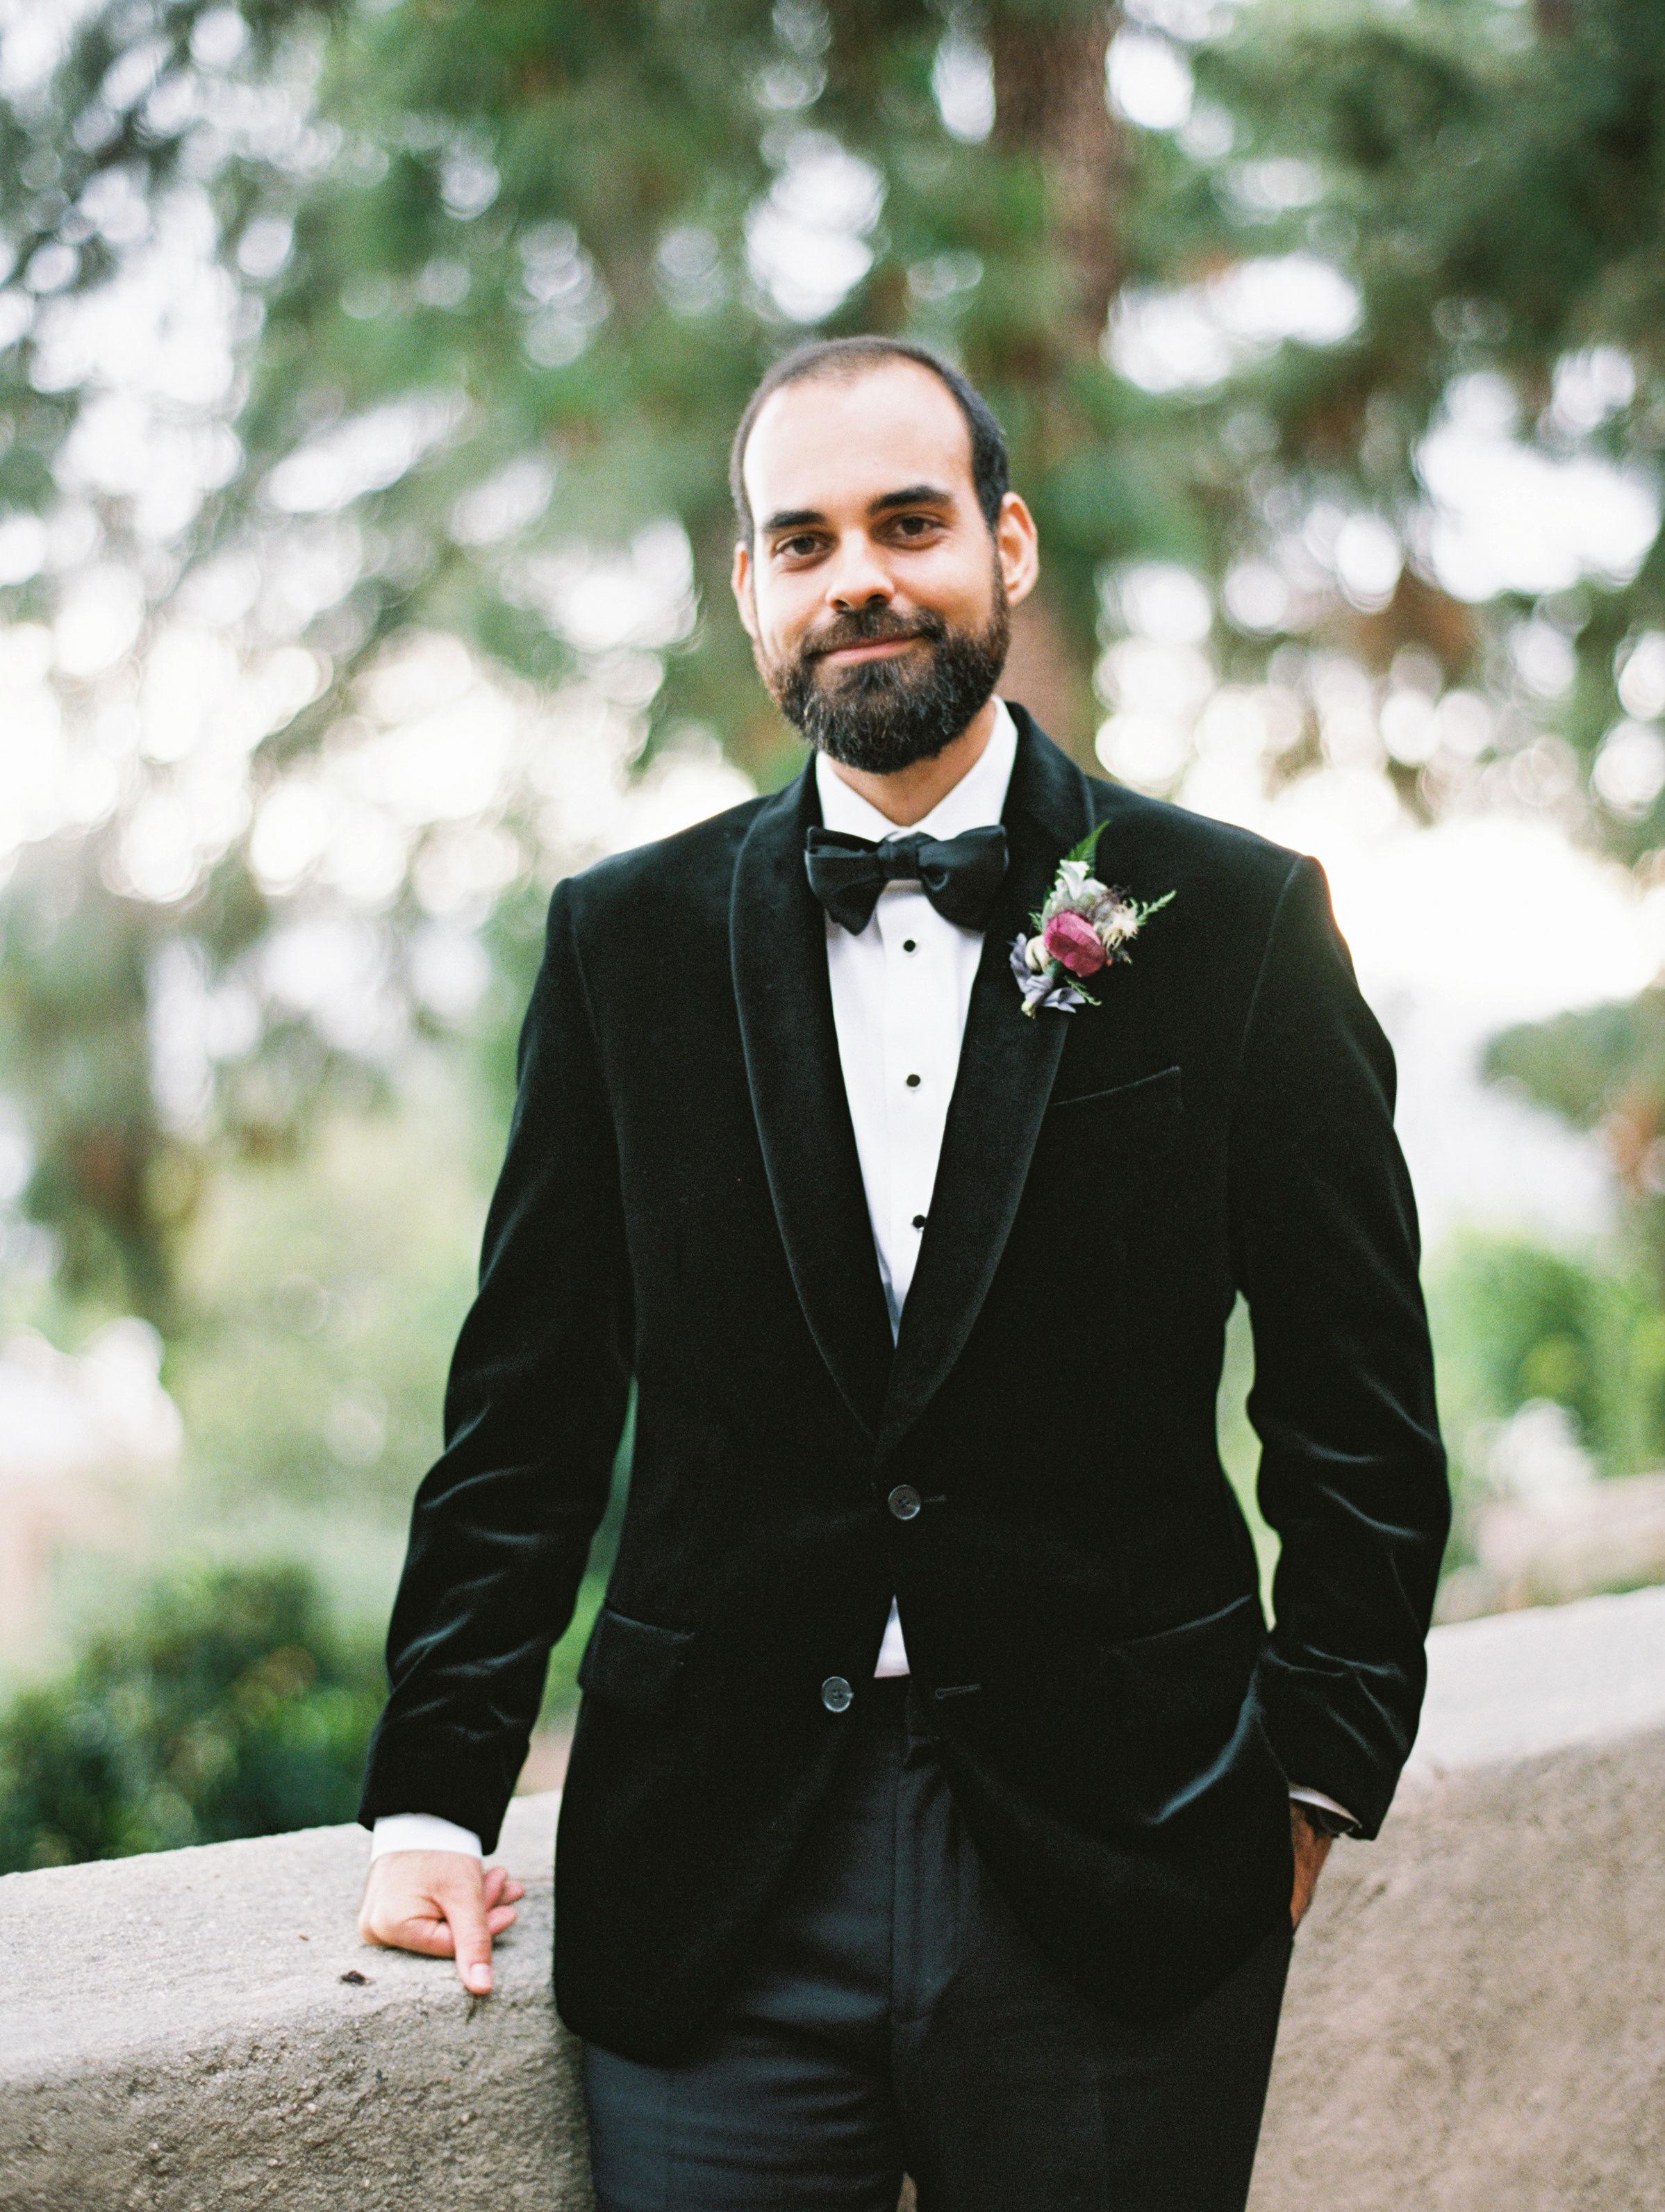 jamie and michael wedding groom suit